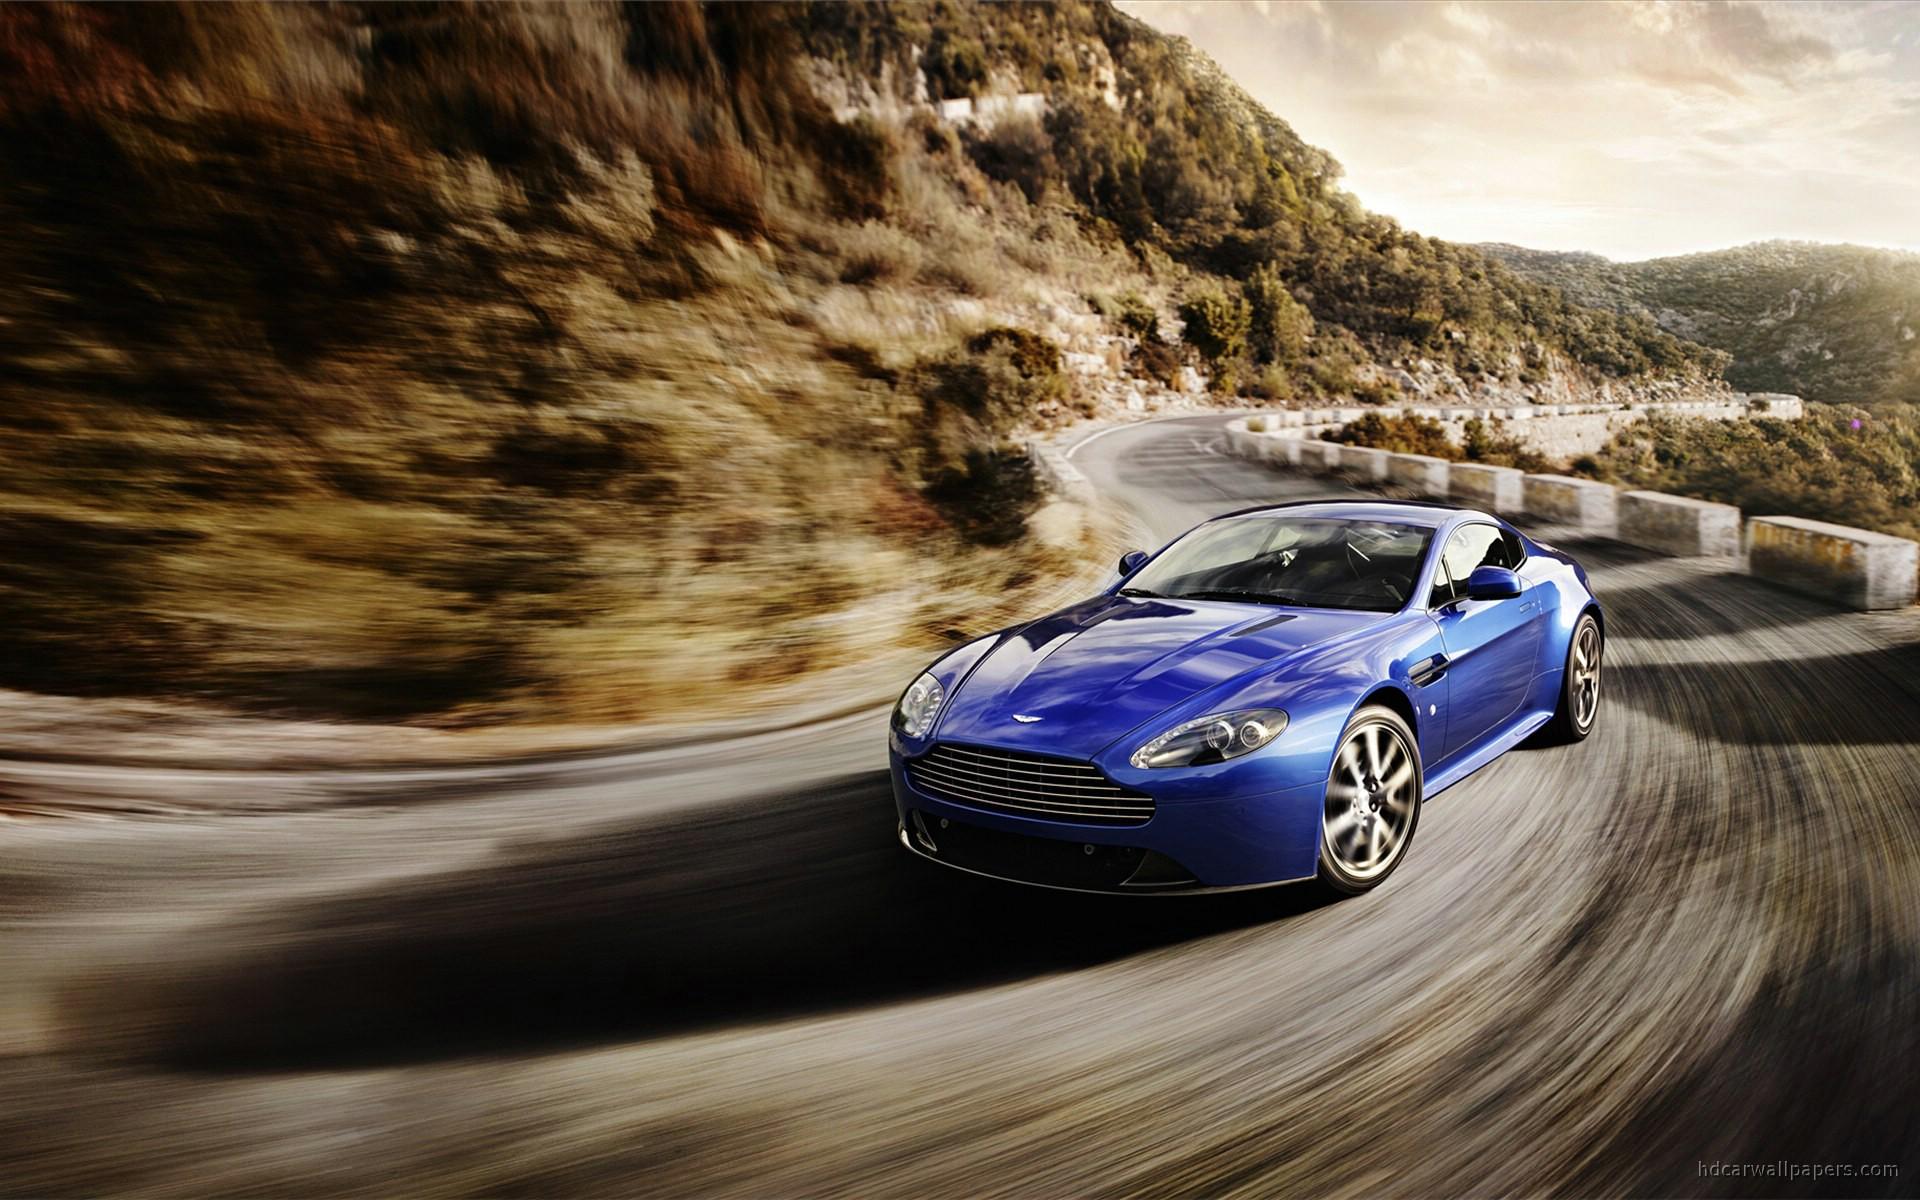 37 Aston Martin V8 Vantage Wallpapers On Wallpapersafari